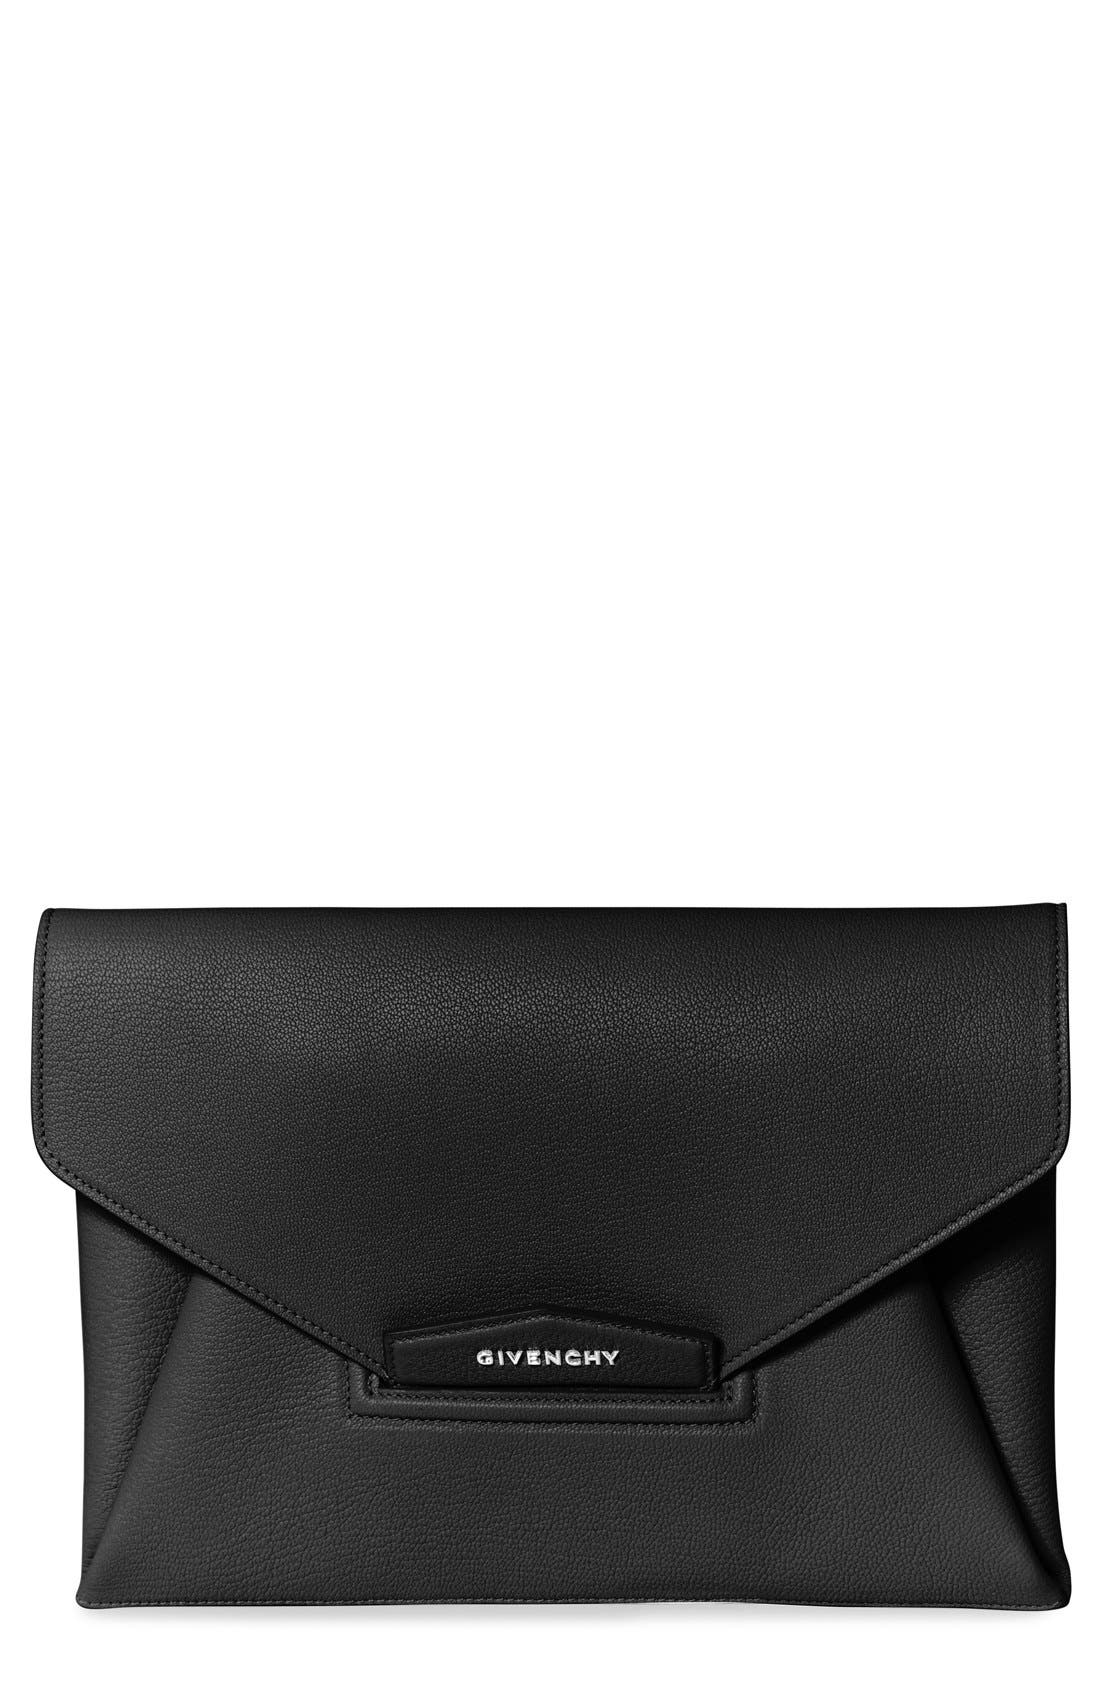 GIVENCHY Medium Antigona Leather Envelope Clutch